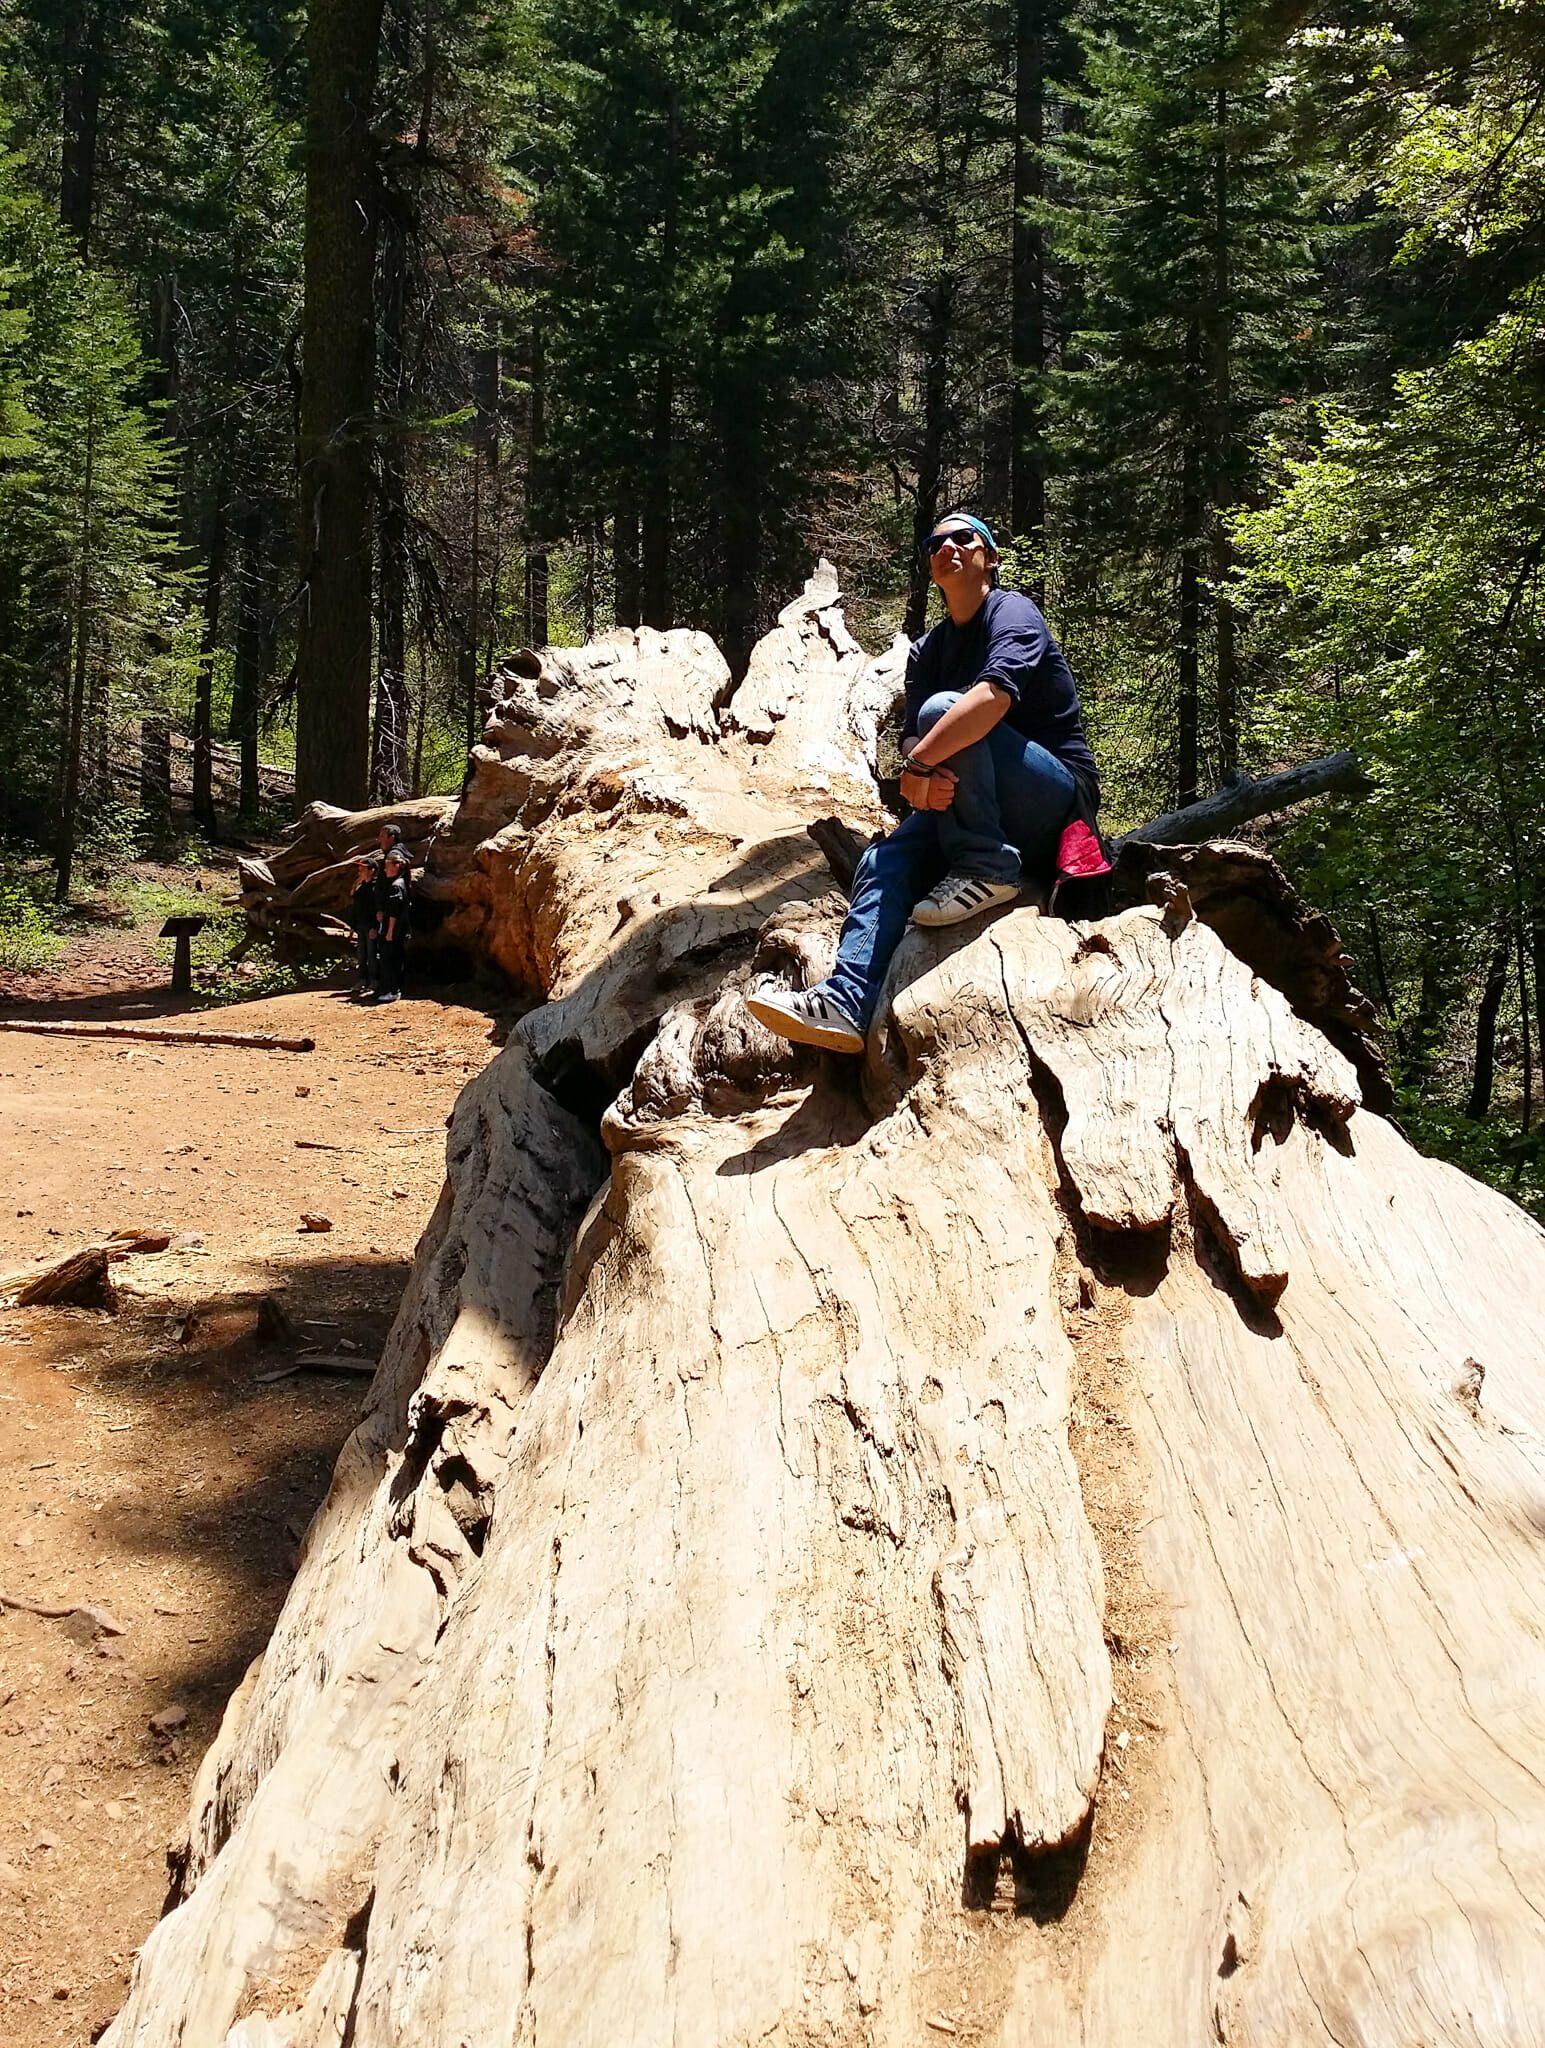 Virgo Sequoia geant